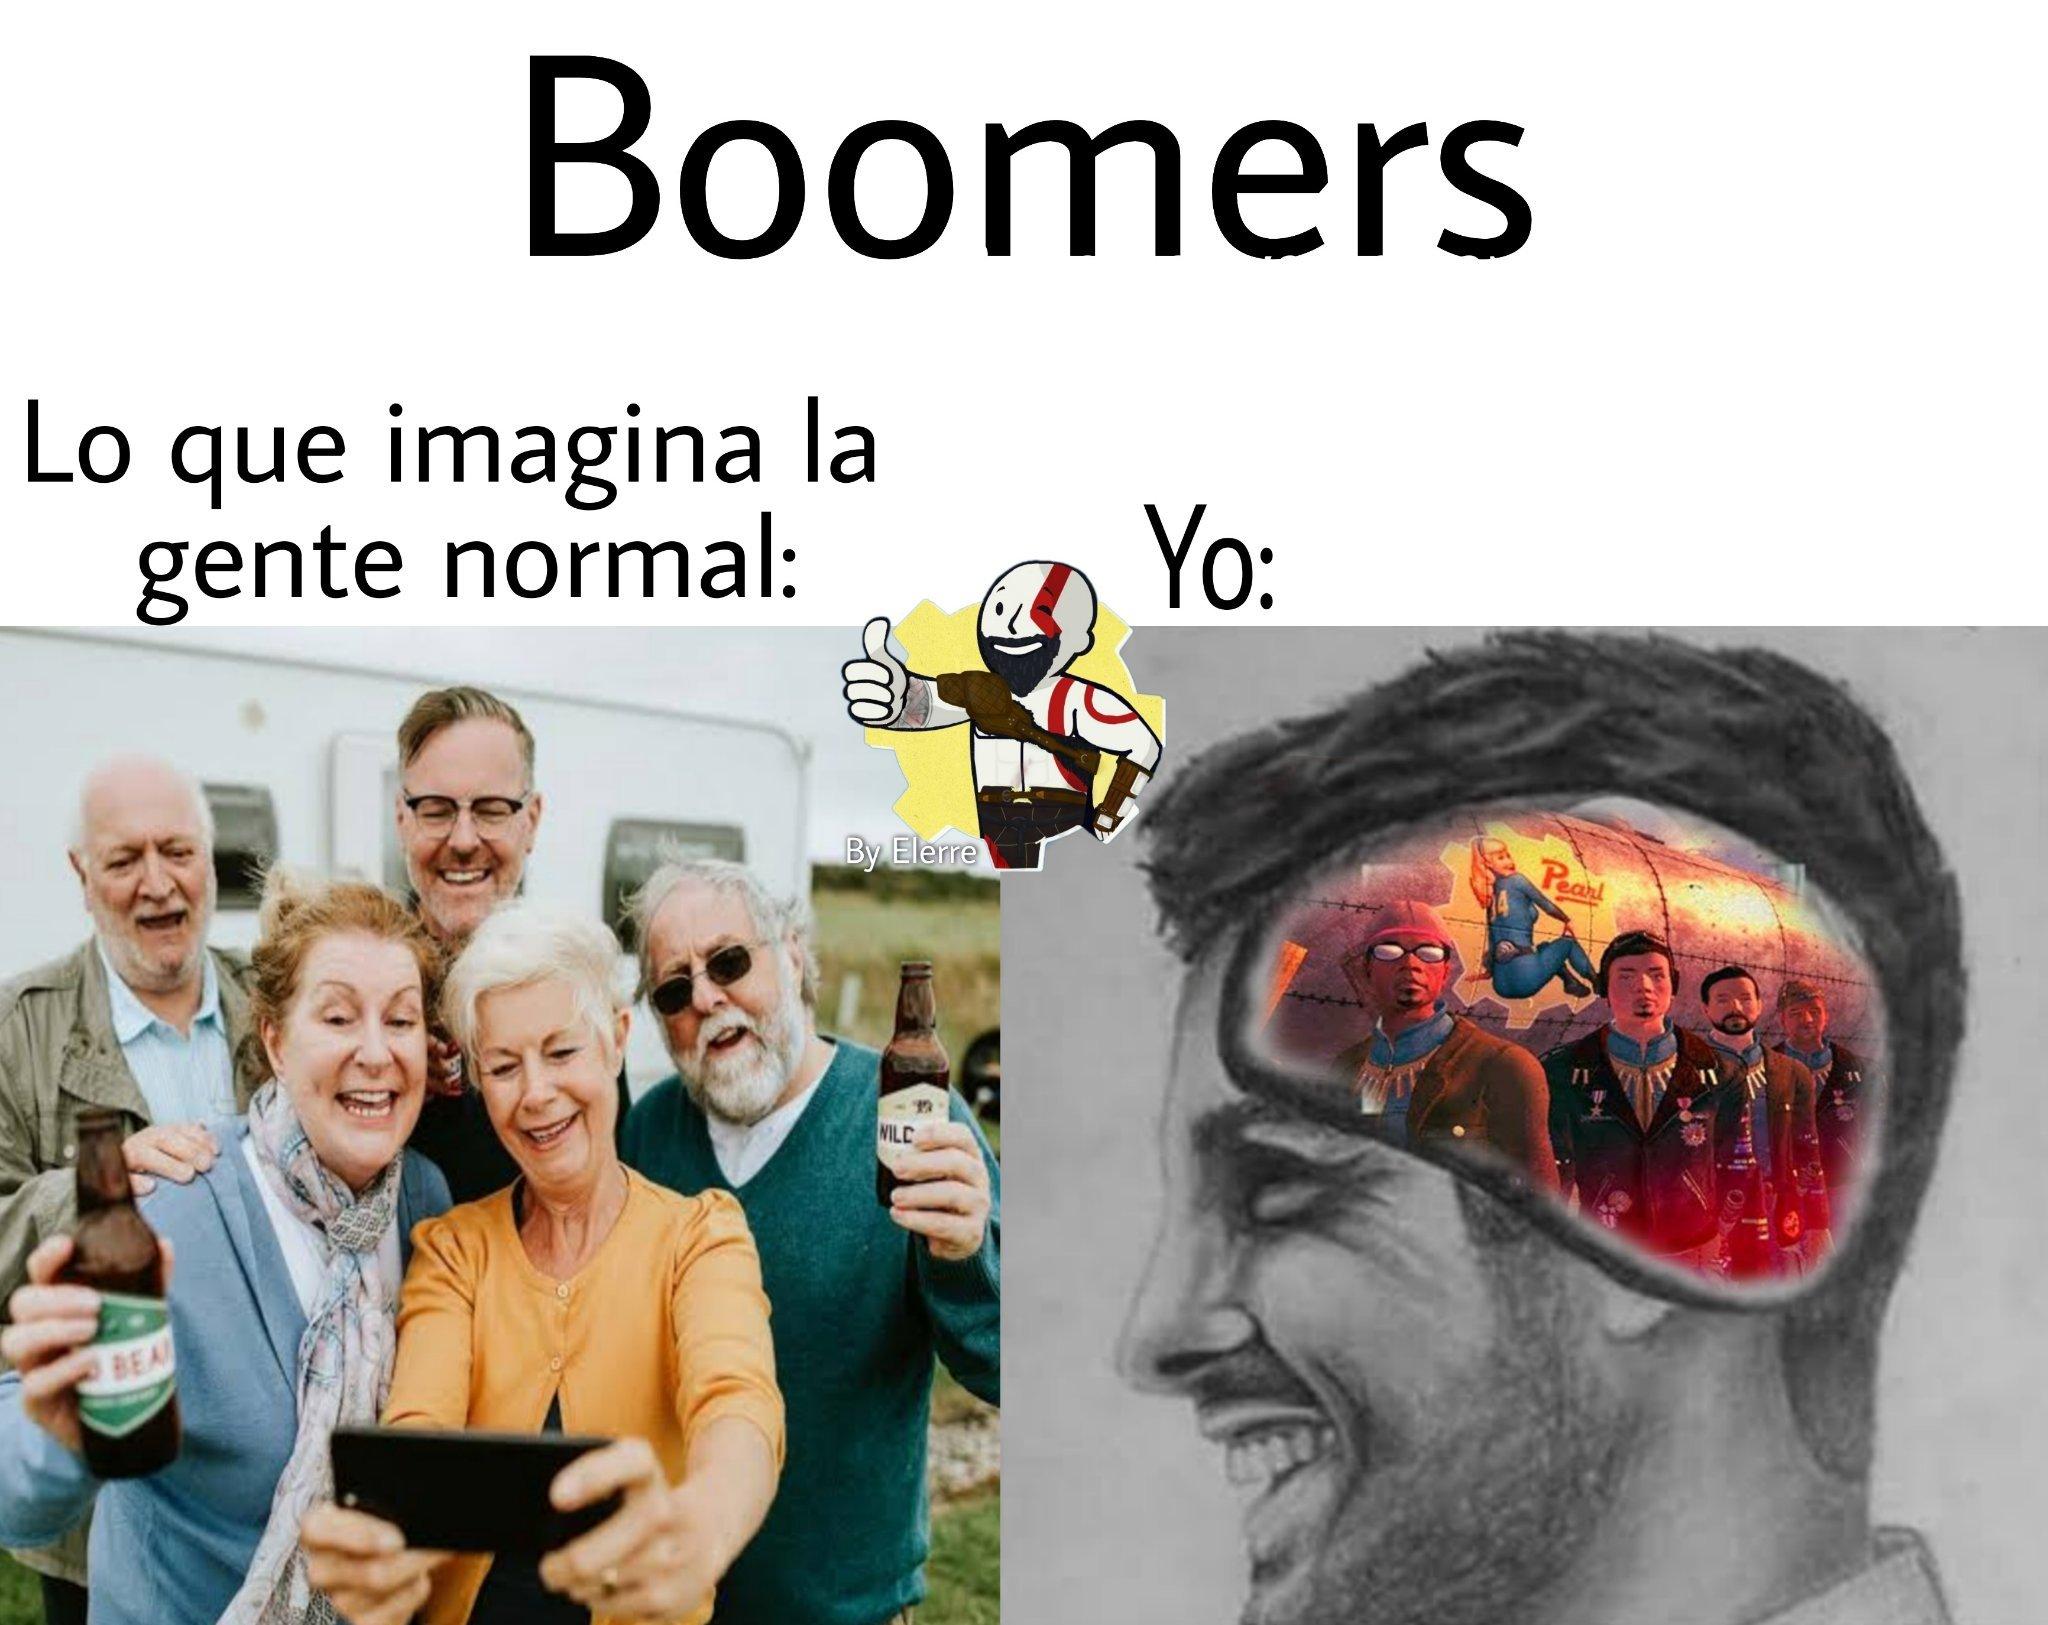 Los boomers son una faccion secundaria de fallout new vegas - meme